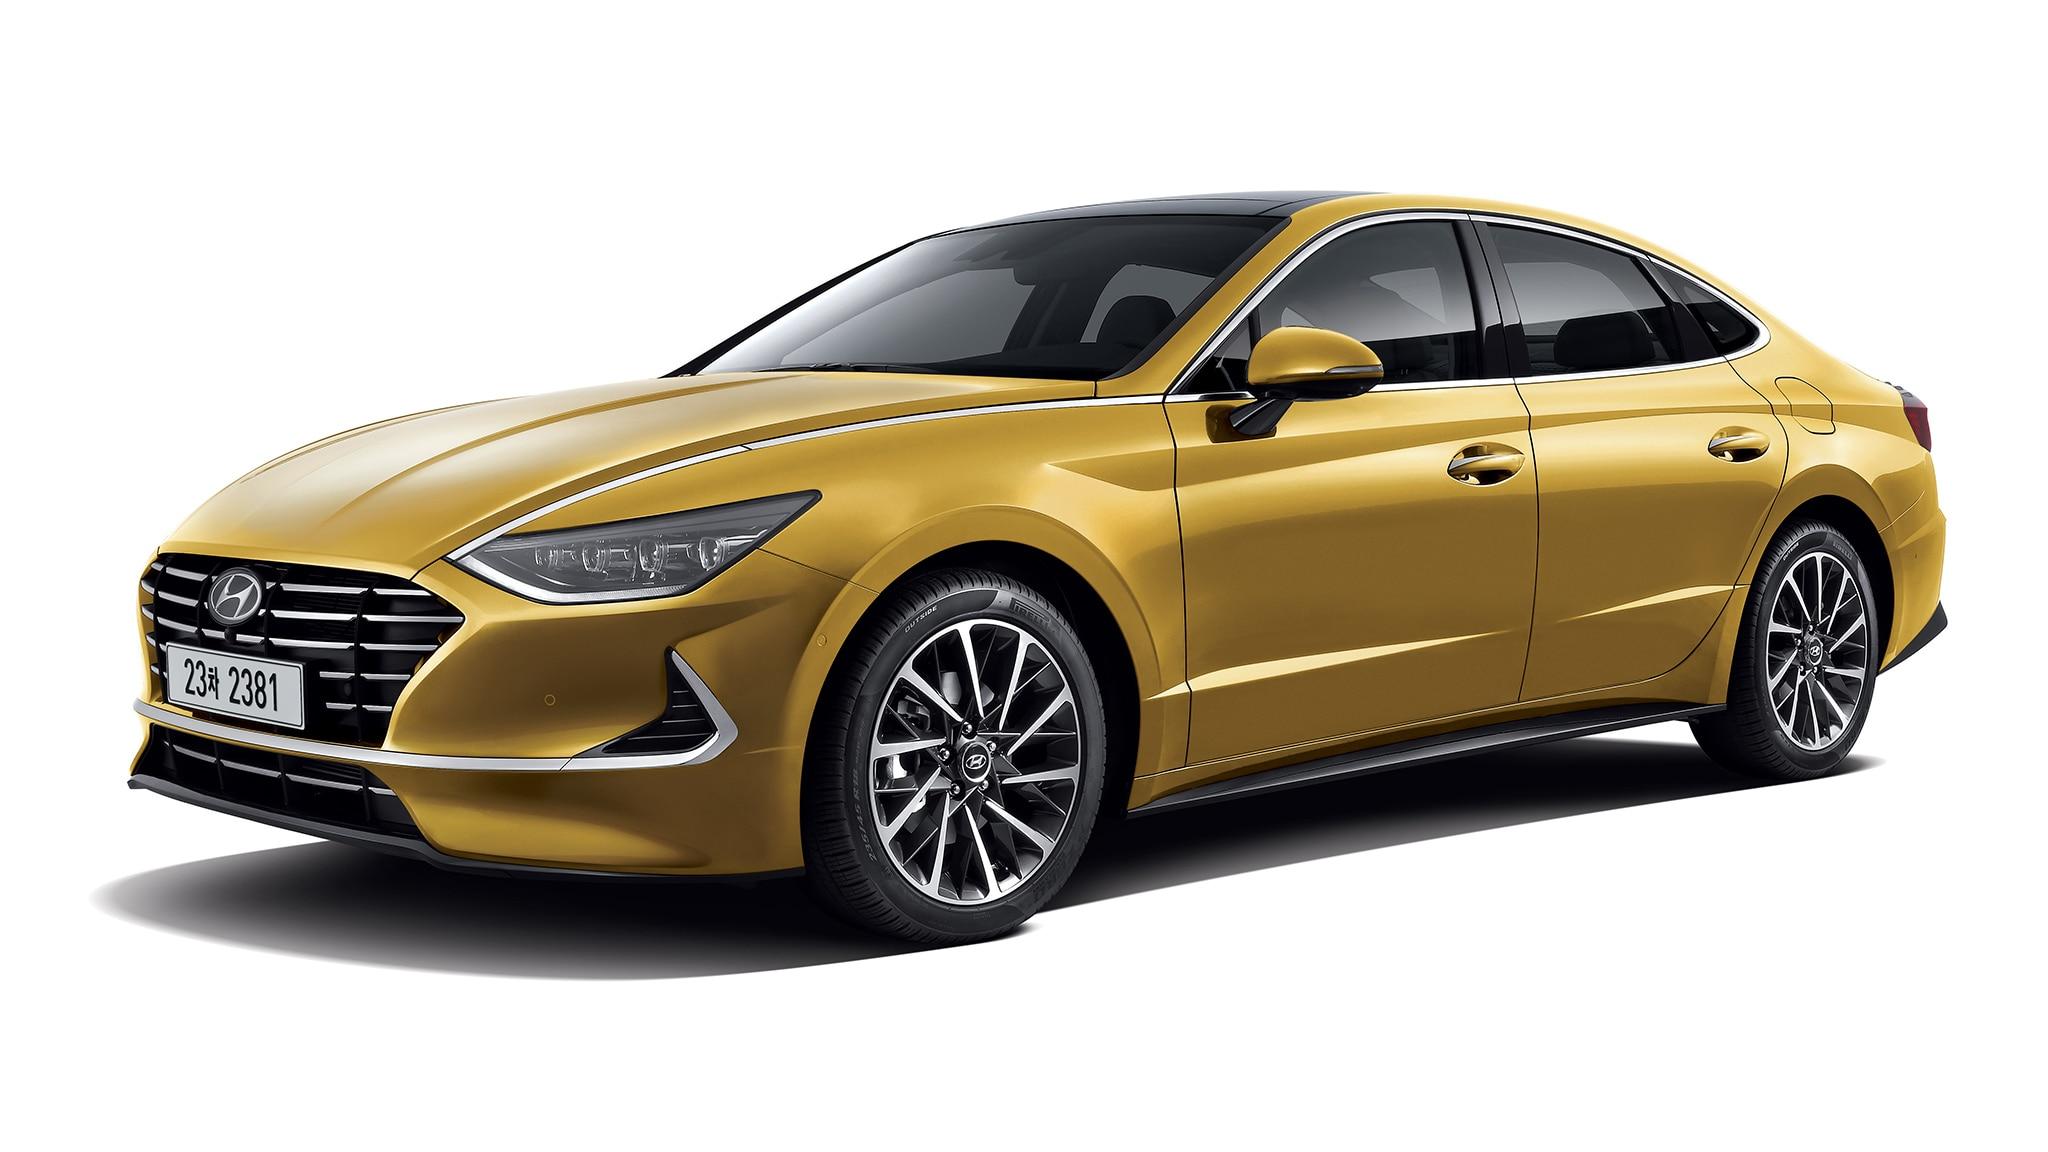 2020 Hyundai Sonata Front Side View Studio